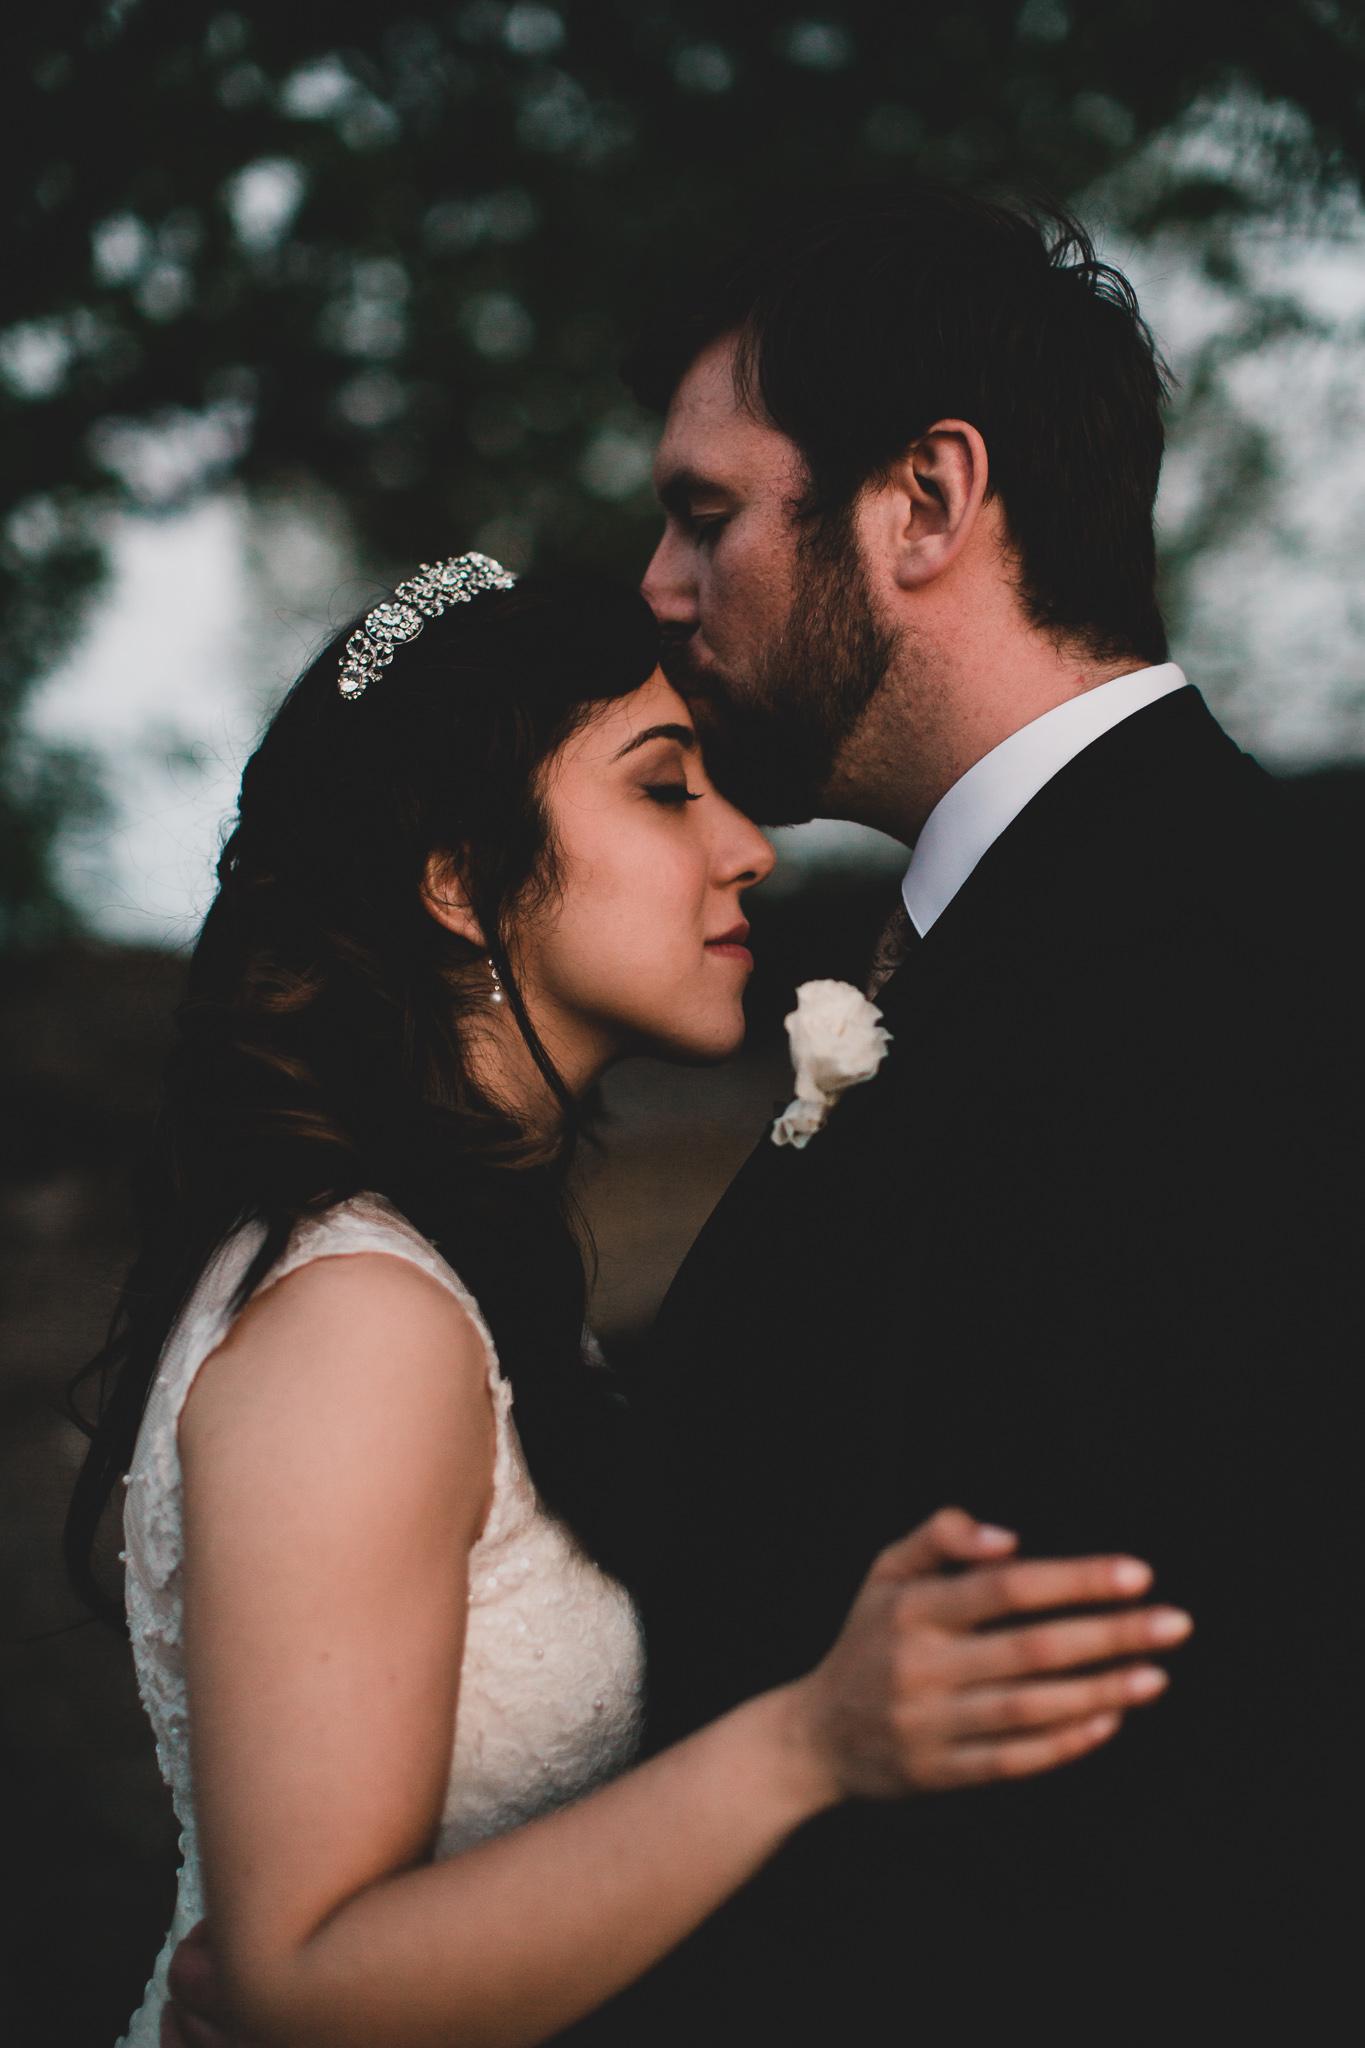 Romantic evening wedding portraits